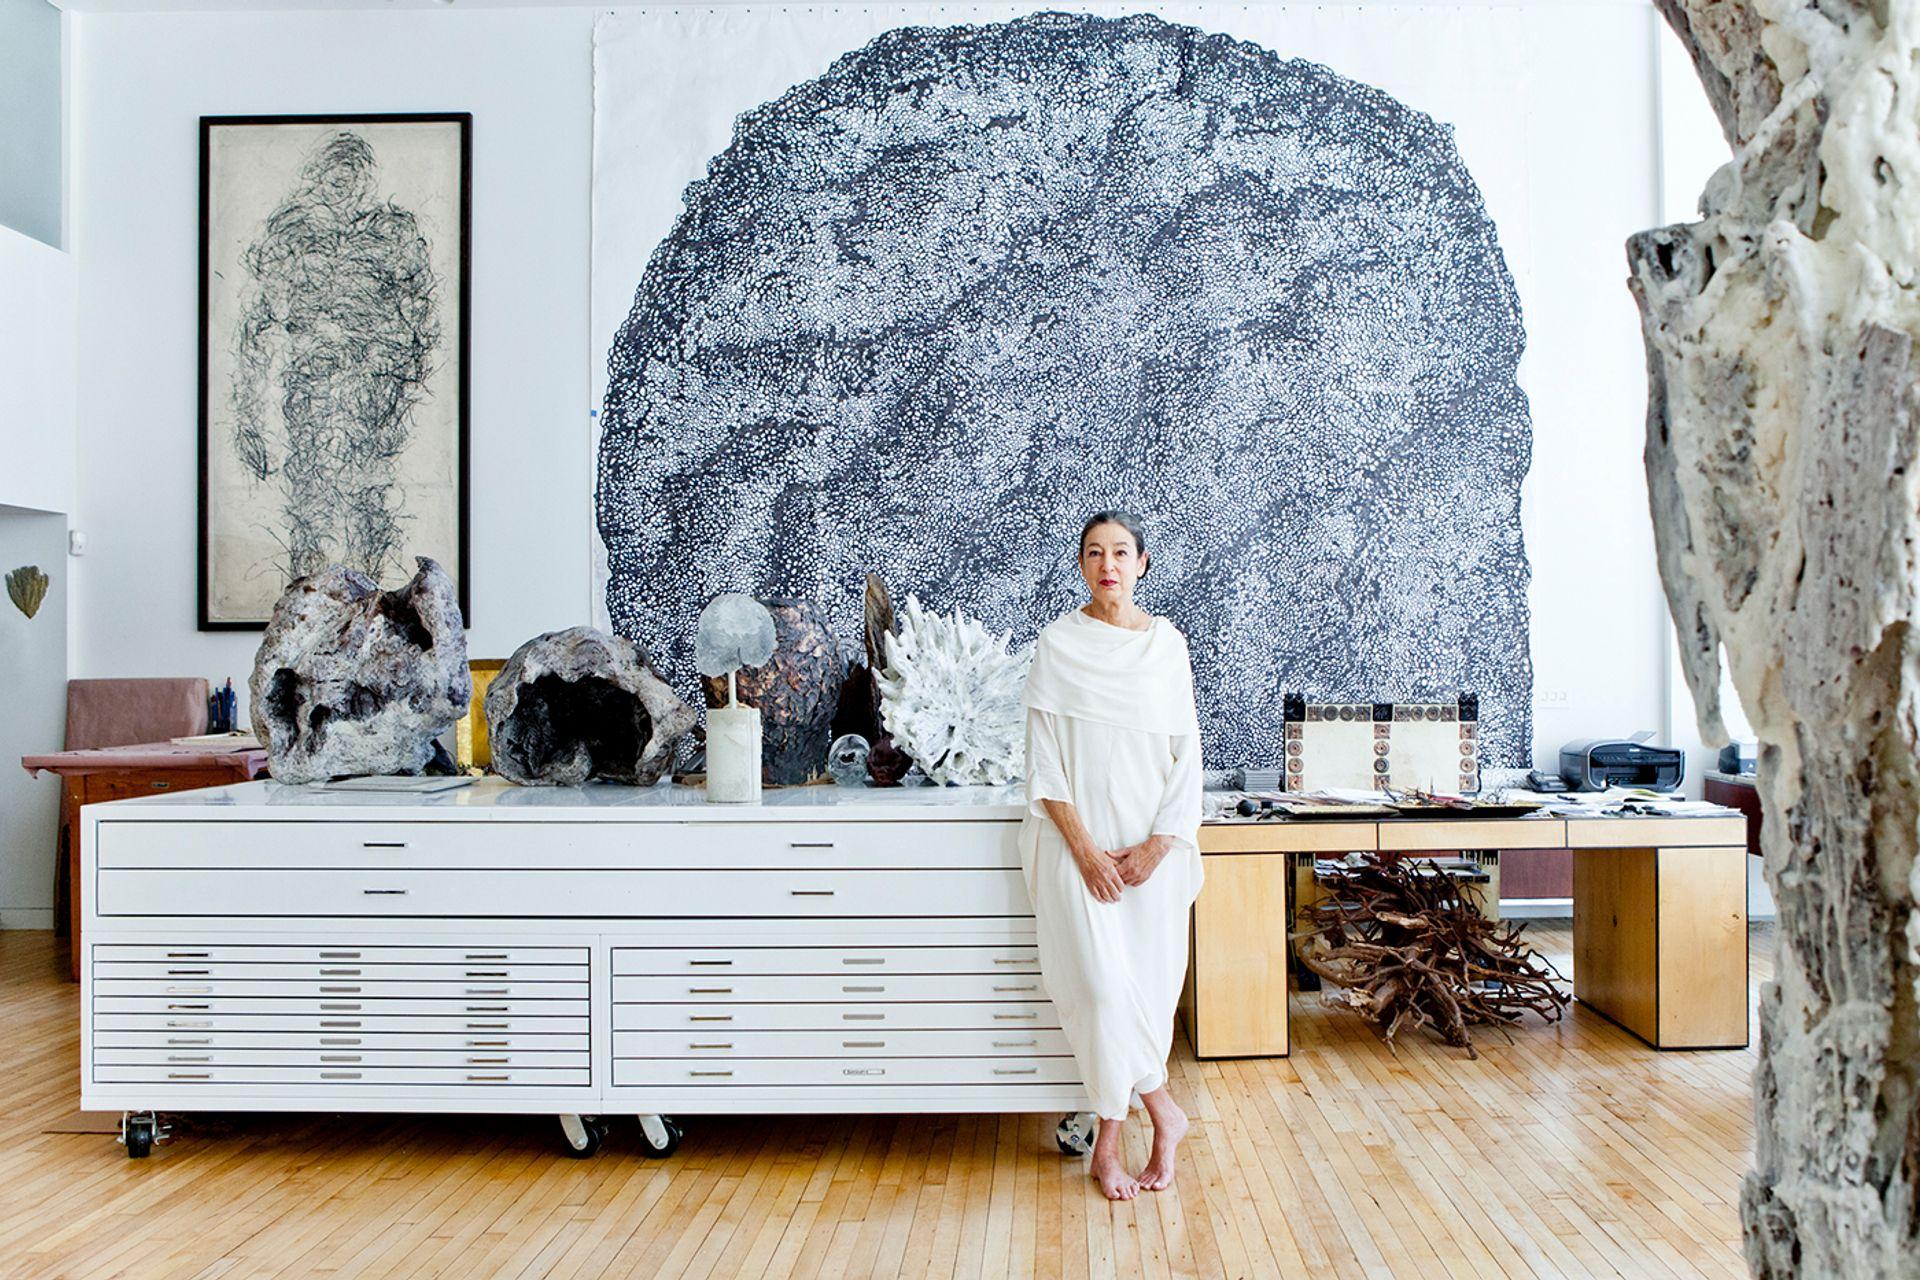 Michele Oka Doner in her New York studio Photo: Gerald Forster